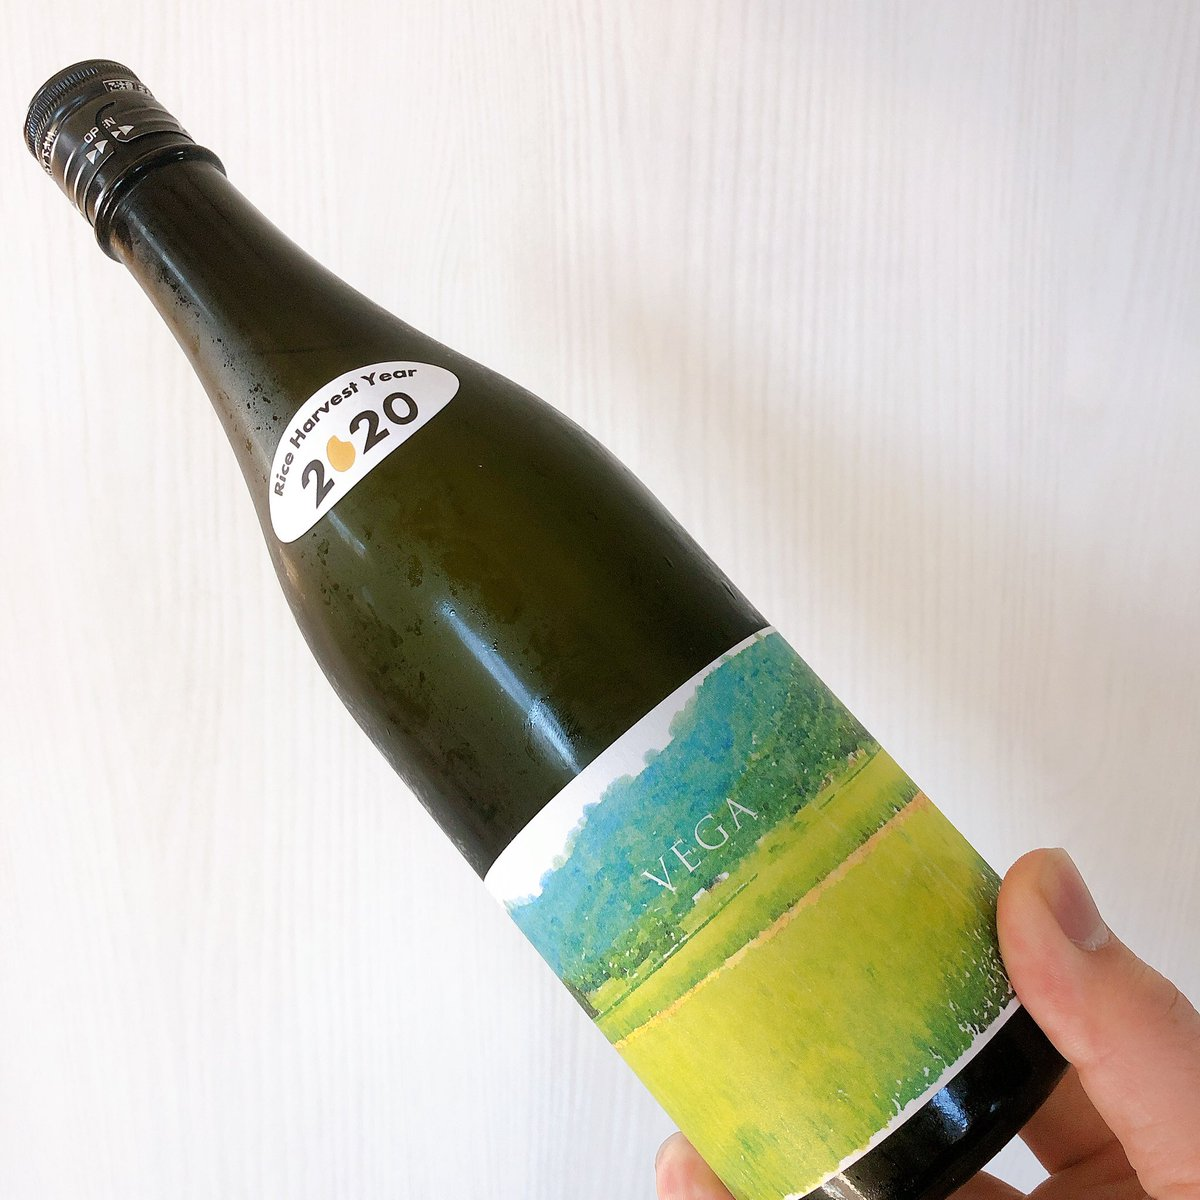 test ツイッターメディア - あべ VEGA 生 新潟 阿部酒造  ぶどう感もあり、ぶどうの皮の渋みみたいなのもあり、もうこれは 白ワインです!w https://t.co/eRIZmaI8SP